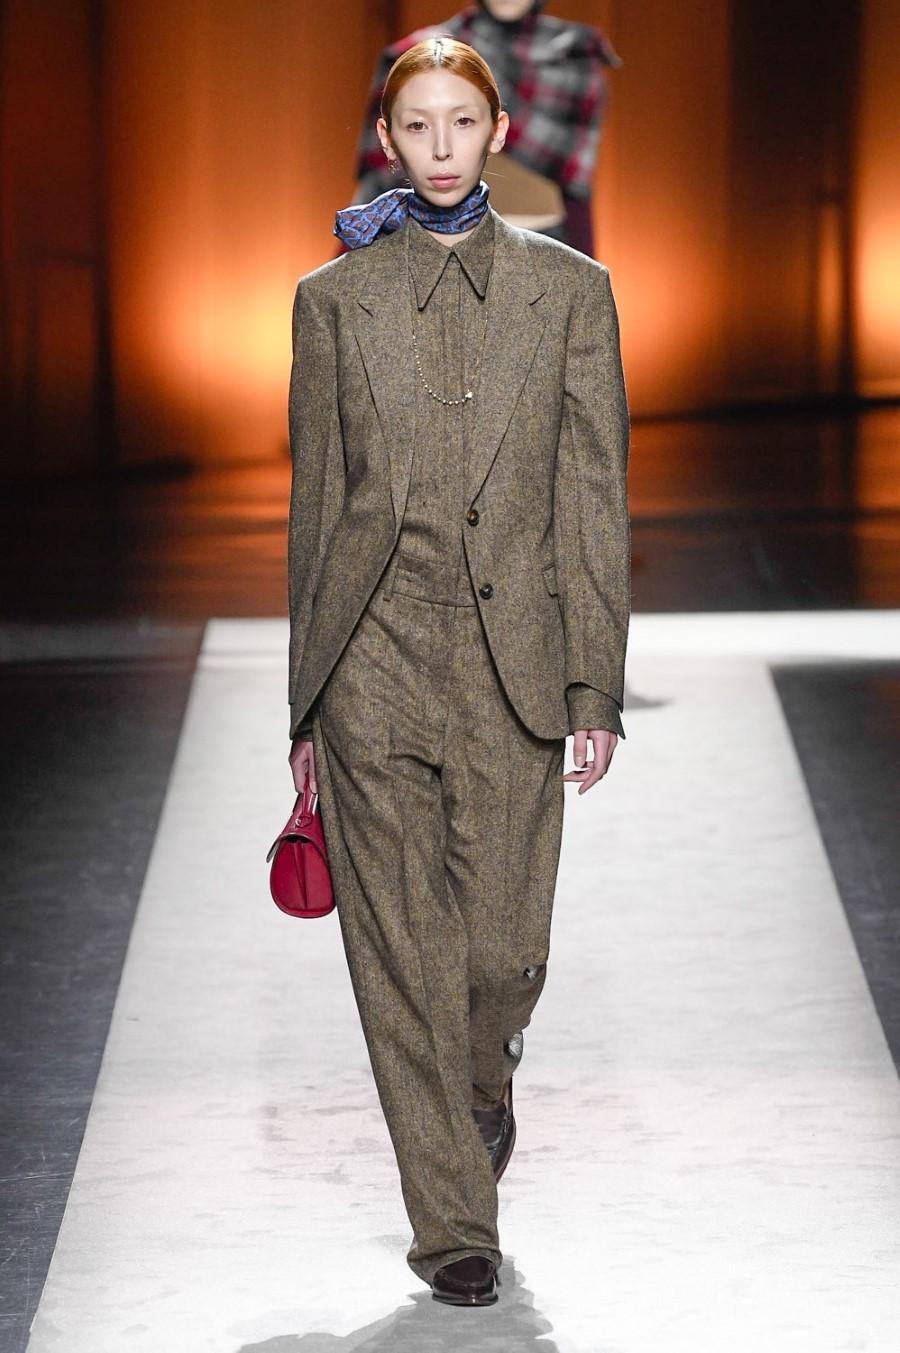 Tod's - Fall Winter 2020 - Milan Fashion WeekTod's - Fall Winter 2020 - Milan Fashion Week